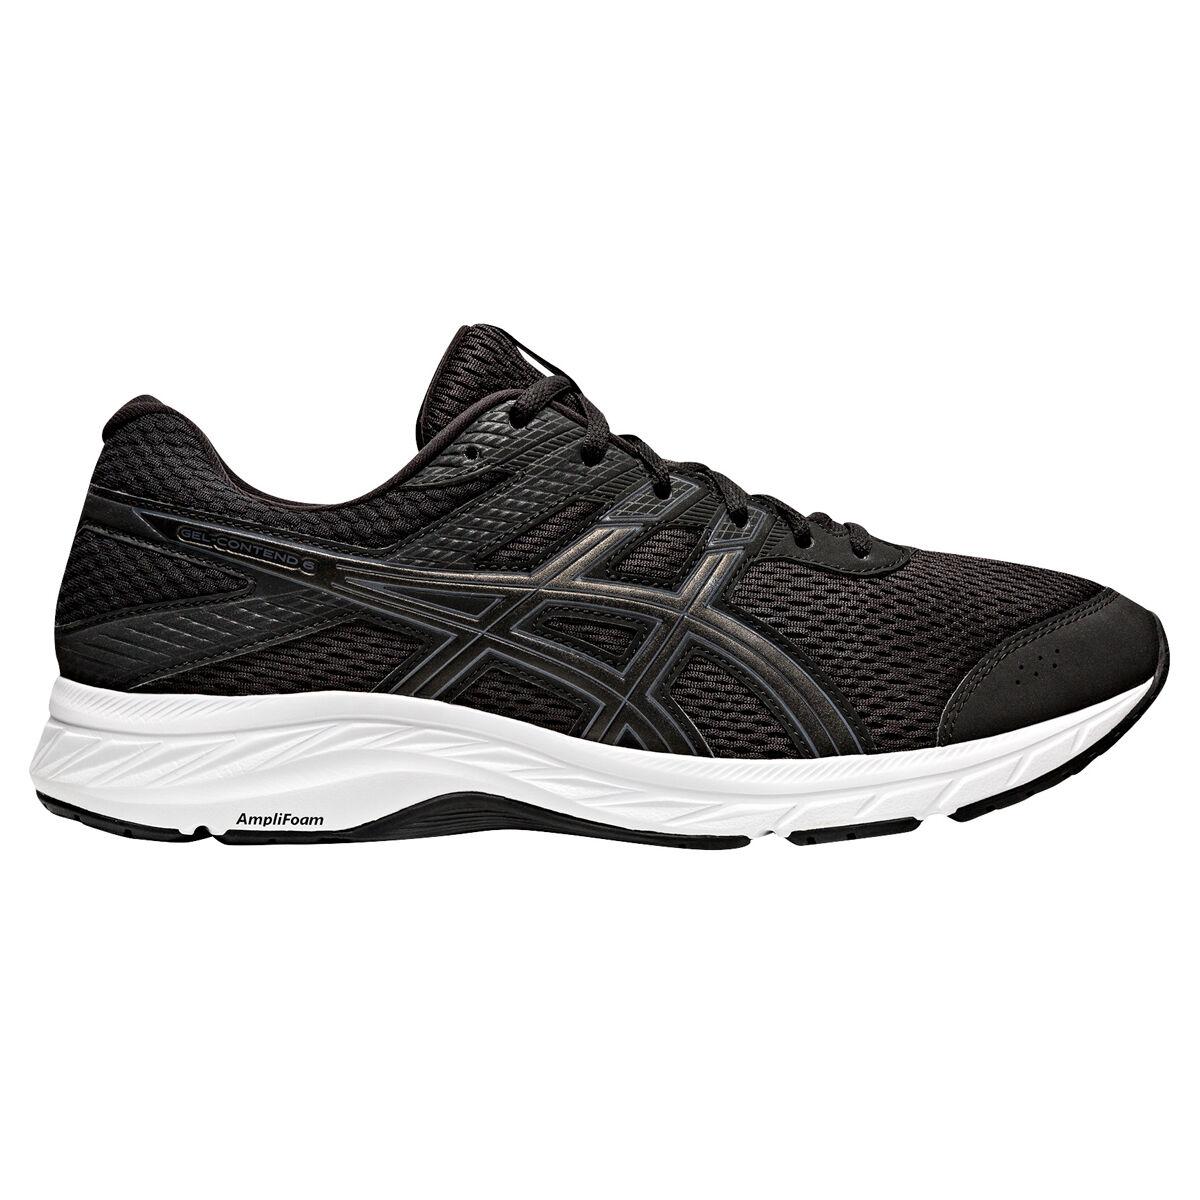 adidas waterproof boots kids clothes shoes women | Asics GEL Contend 6 4E Mens Running Shoes